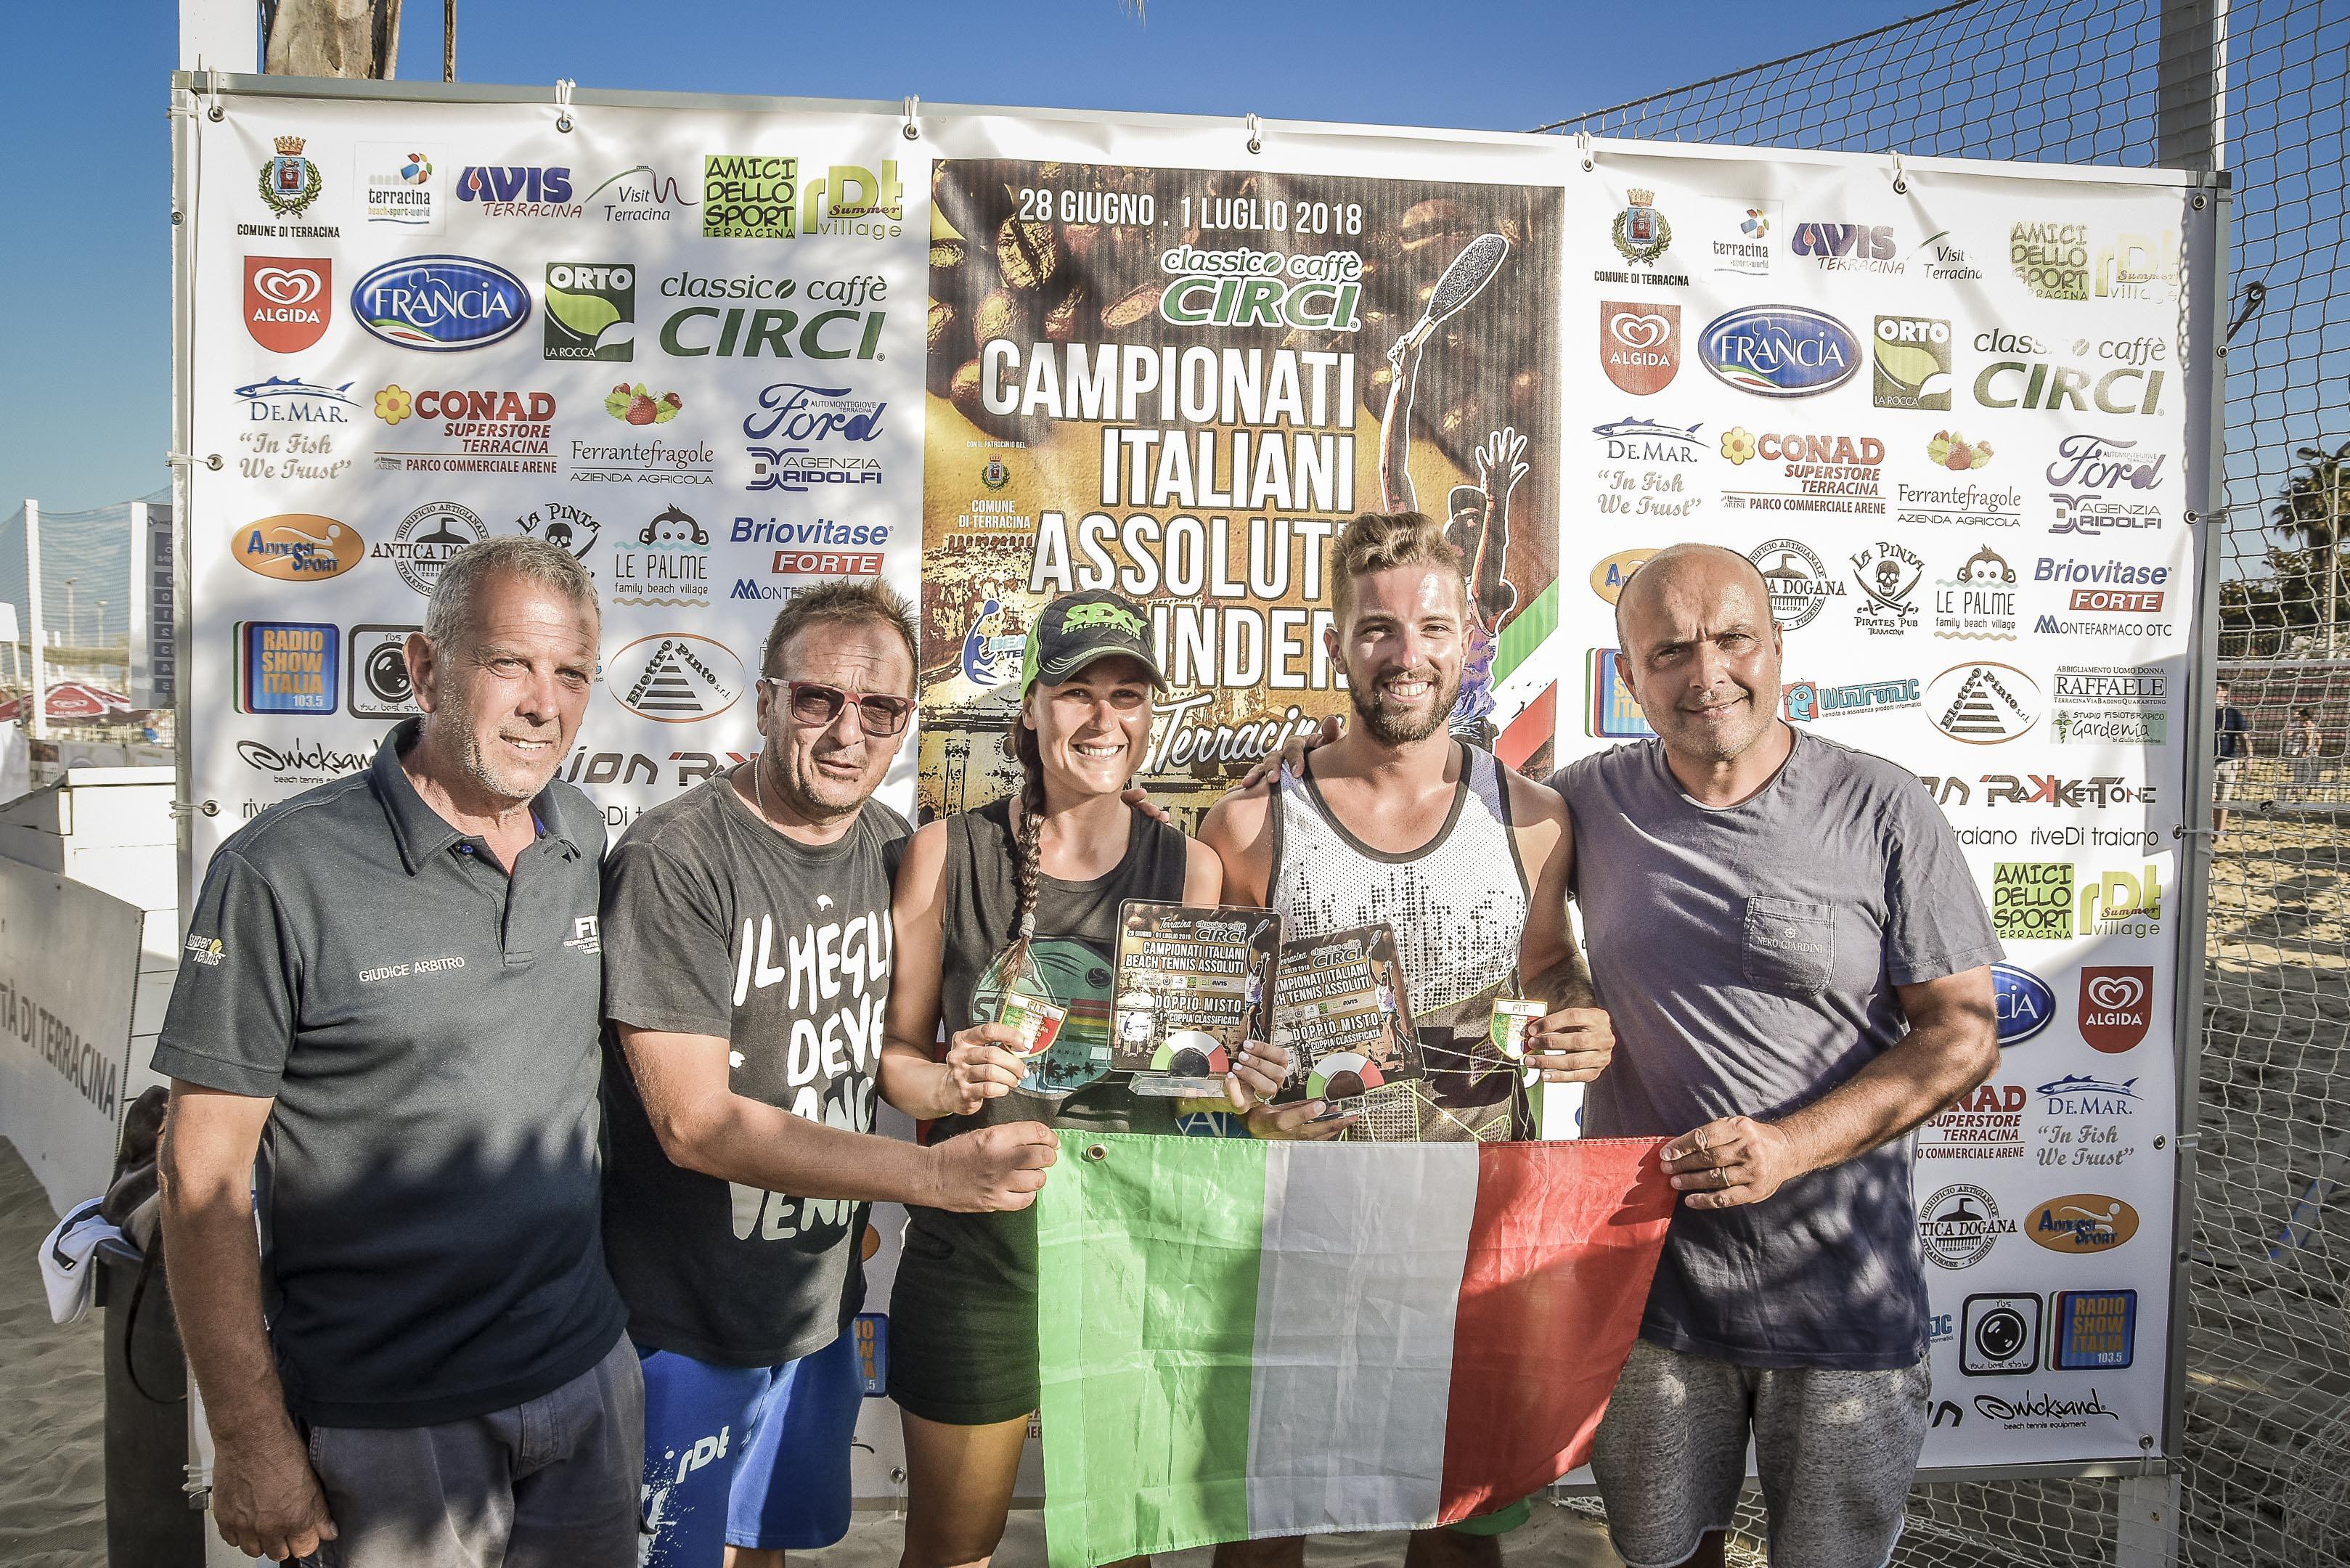 campionati-italiani-terracina-assegna-i-tricolori